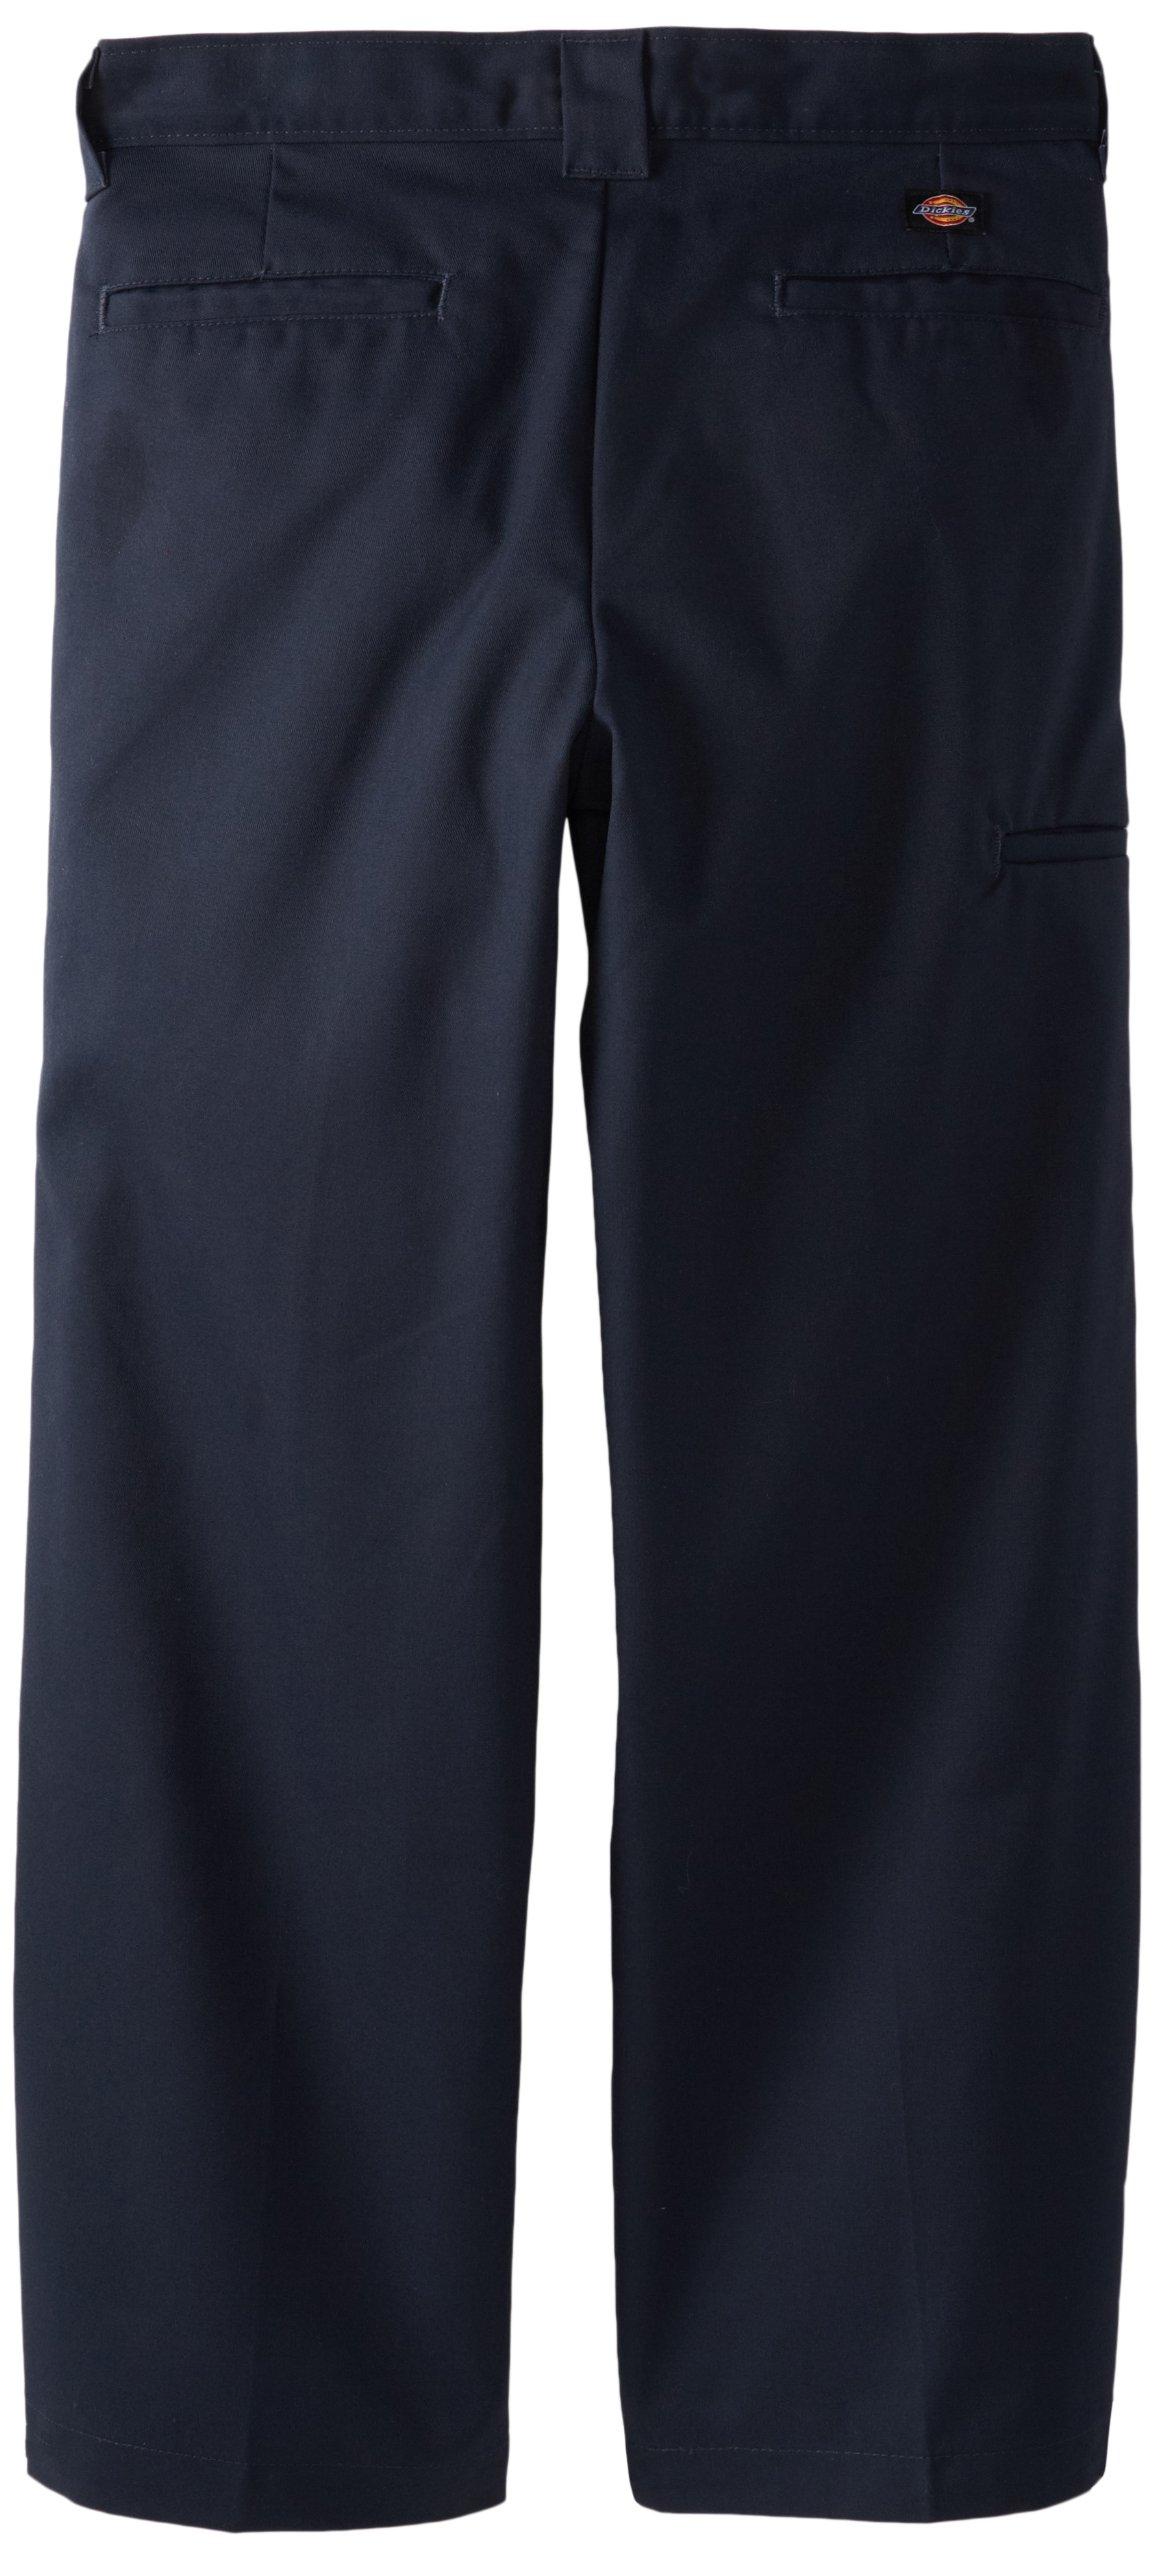 Dickies Big Boys' Flex Waist Double Knee Pant With Extra Pocket, Dark Navy, 18 Husky by Dickies (Image #2)